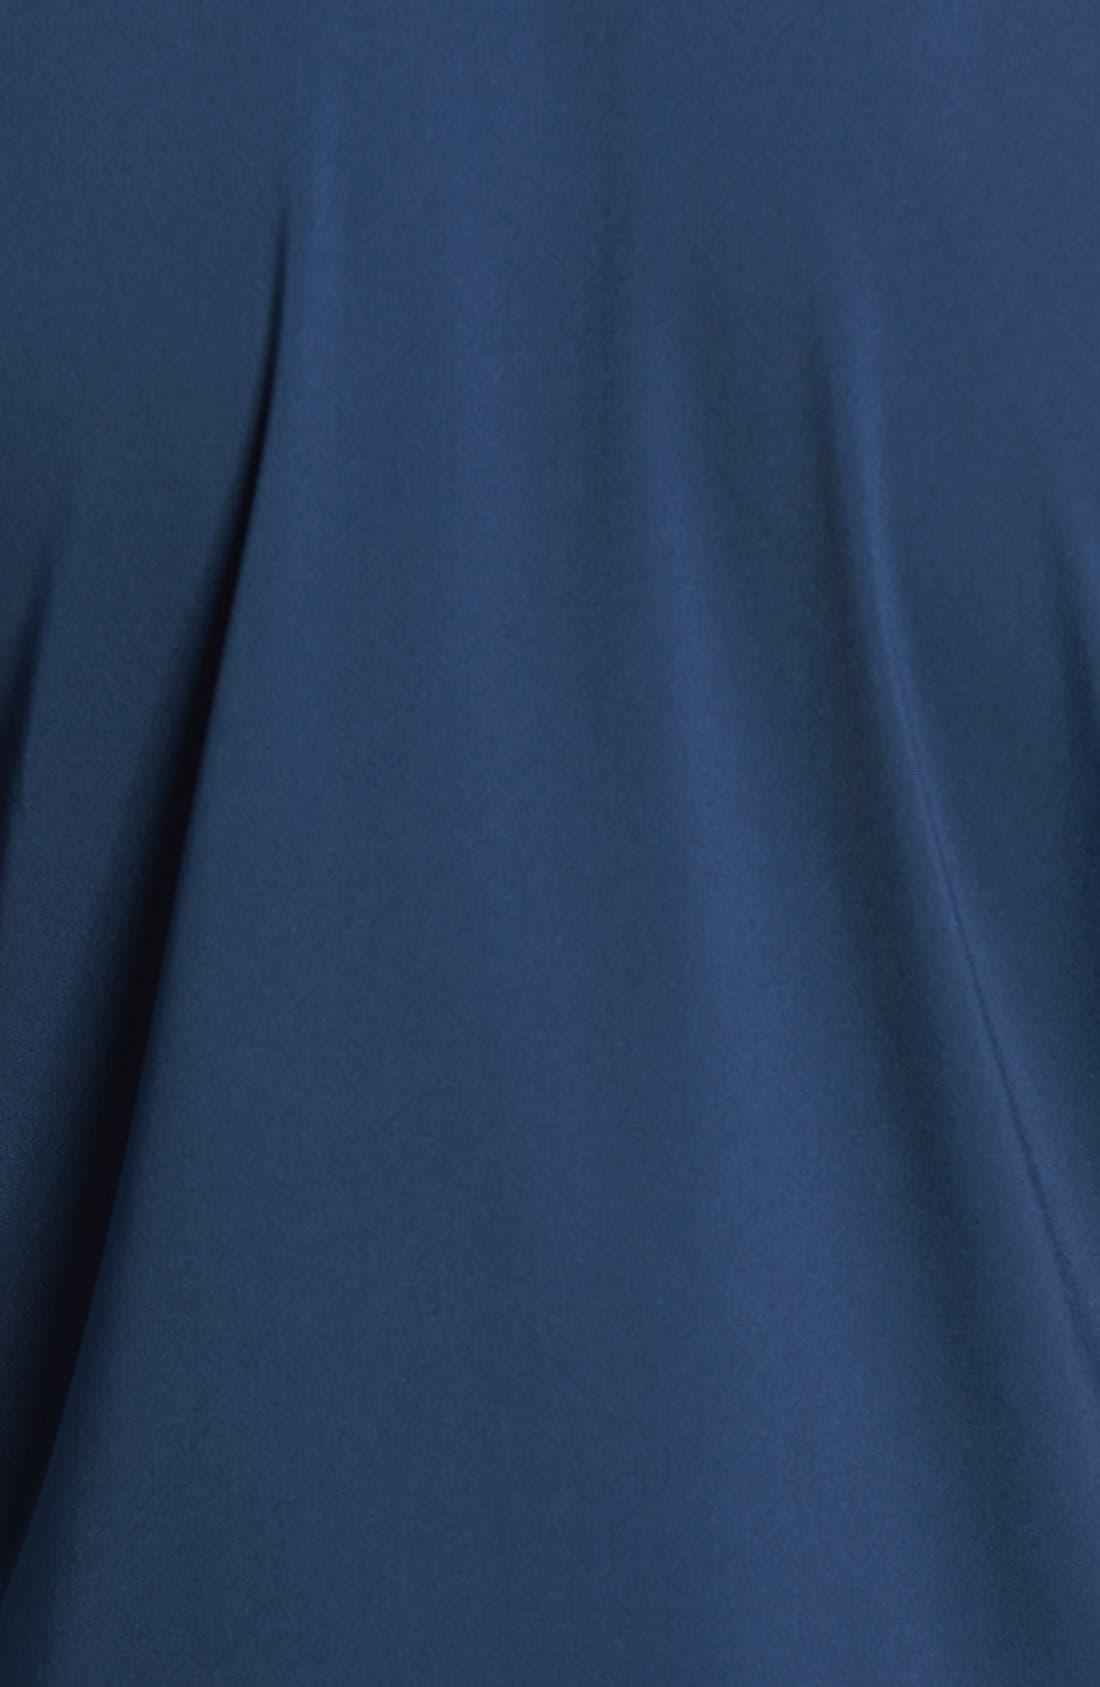 Long Sleeve Stretch Rashguard,                             Alternate thumbnail 9, color,                             DEEP BLUE